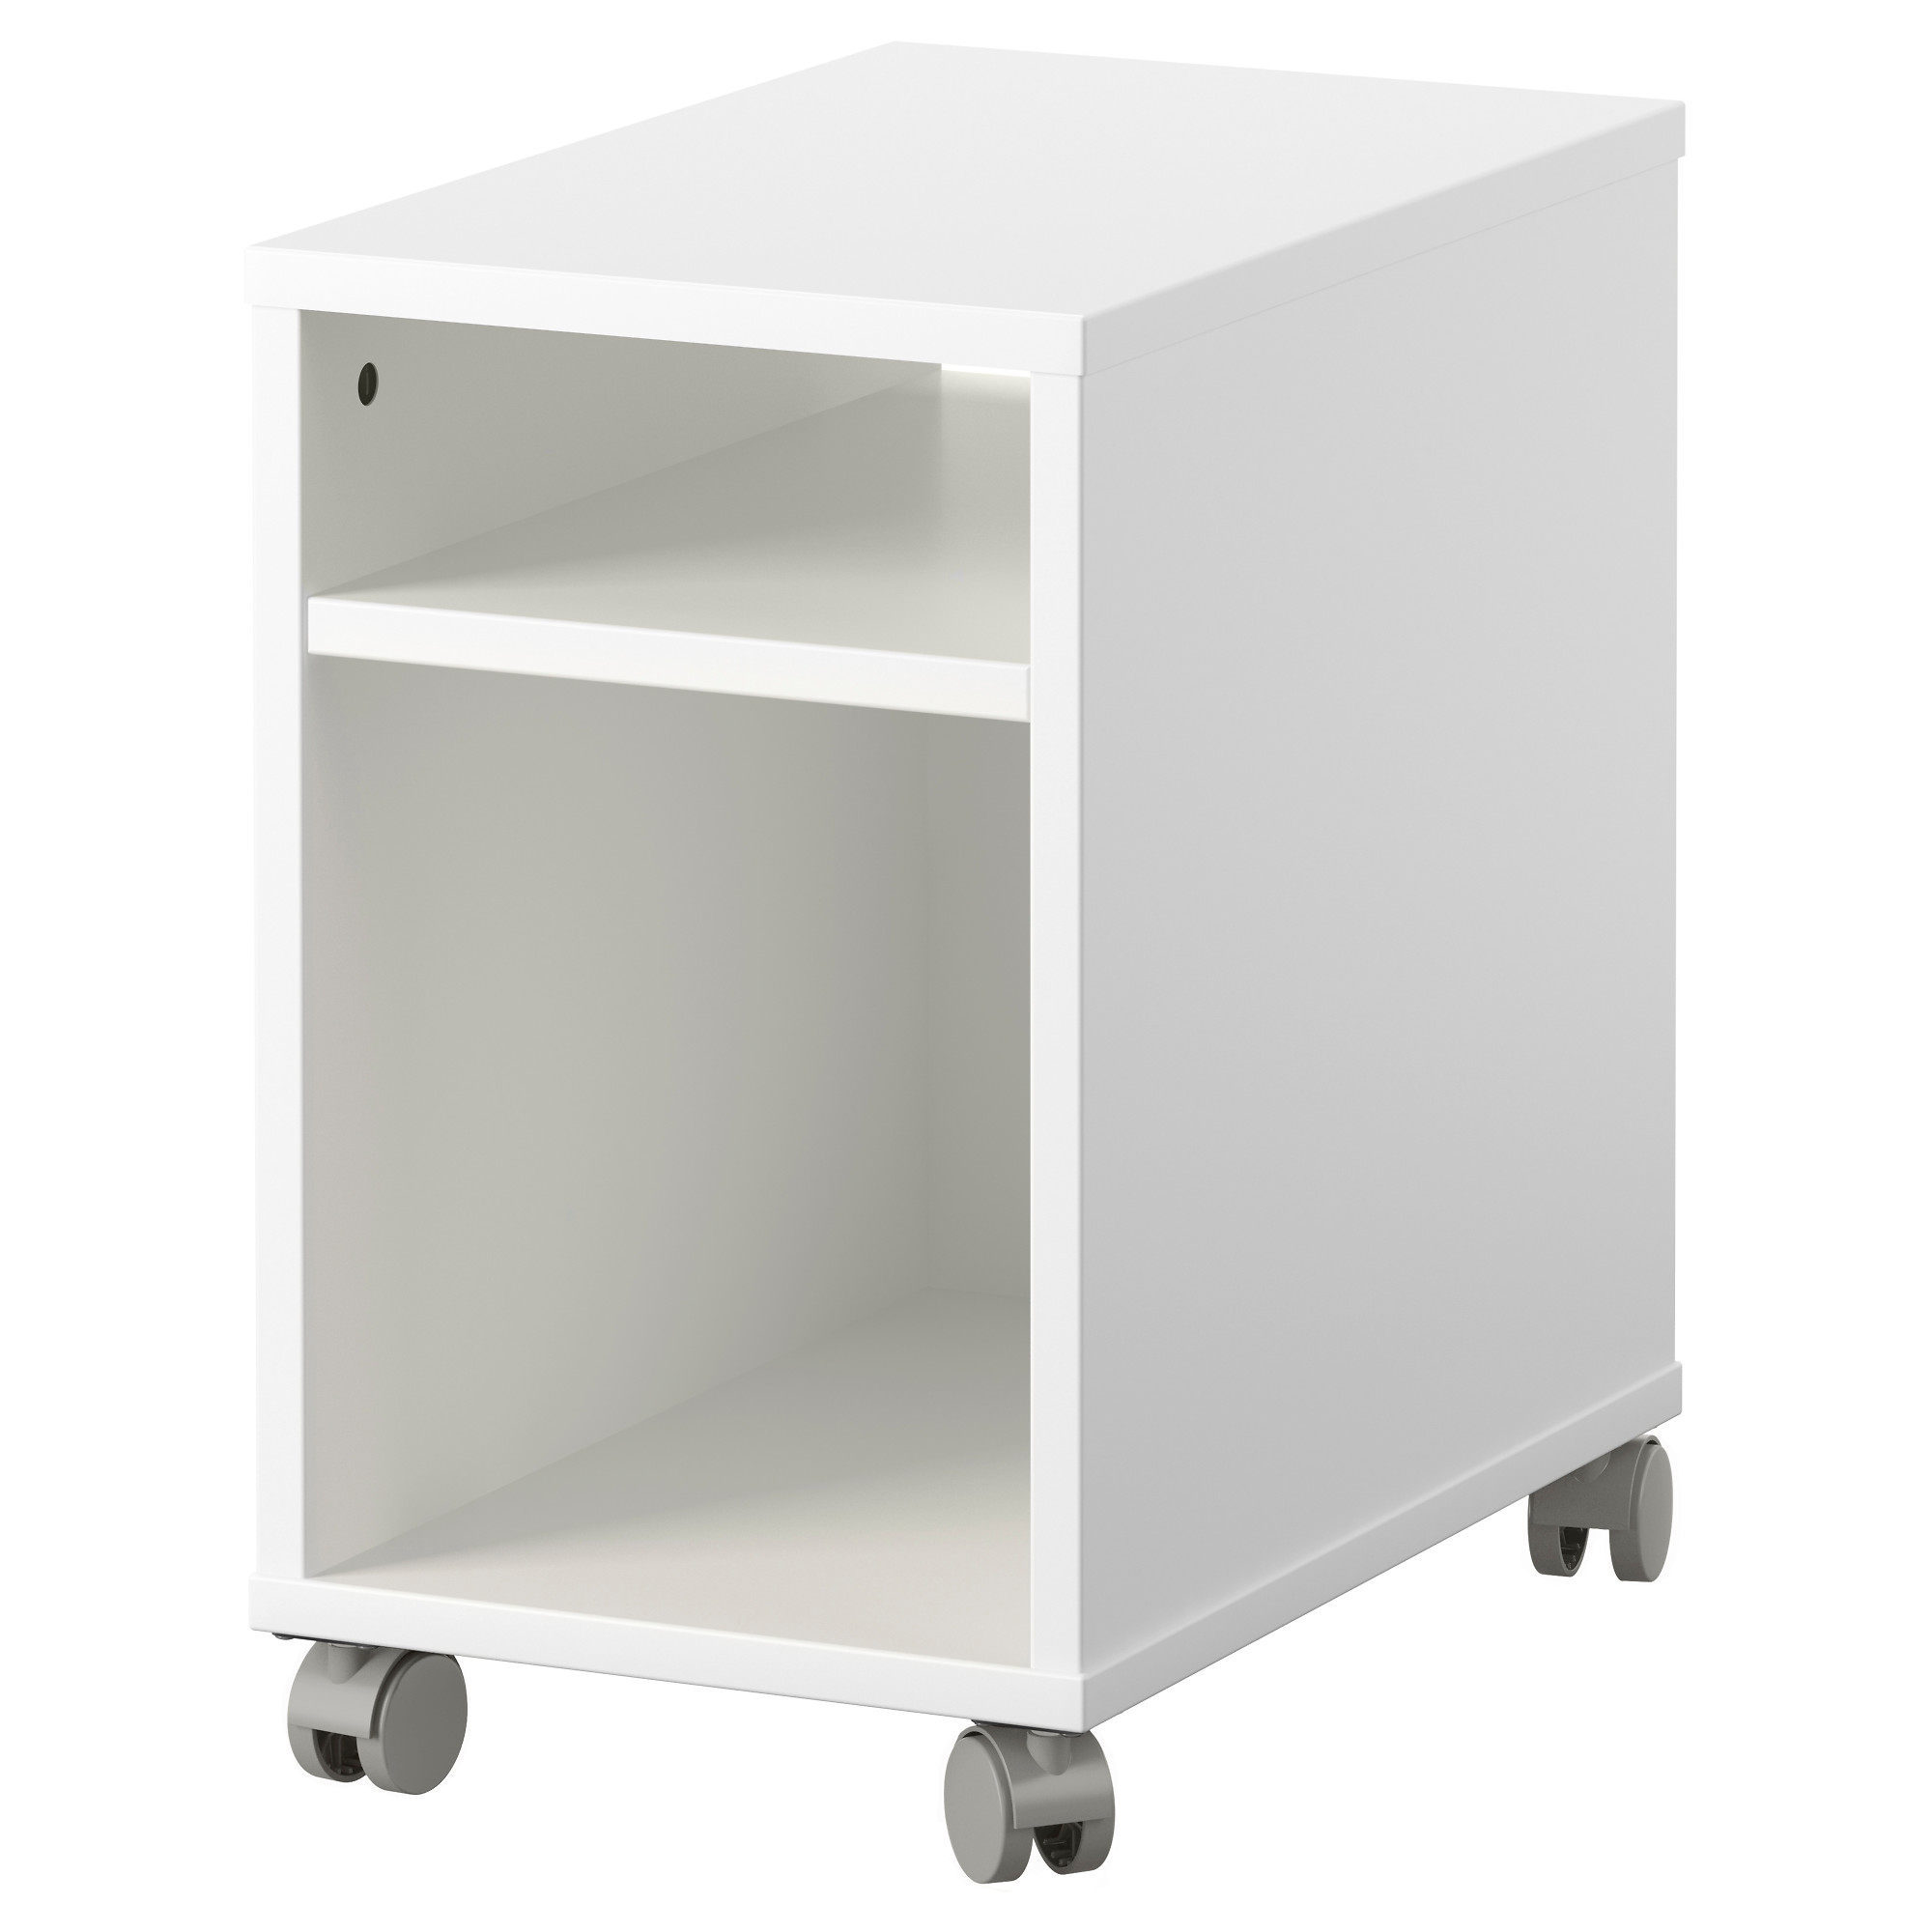 Oltedal Ikea Bedside Tables Komnit Store